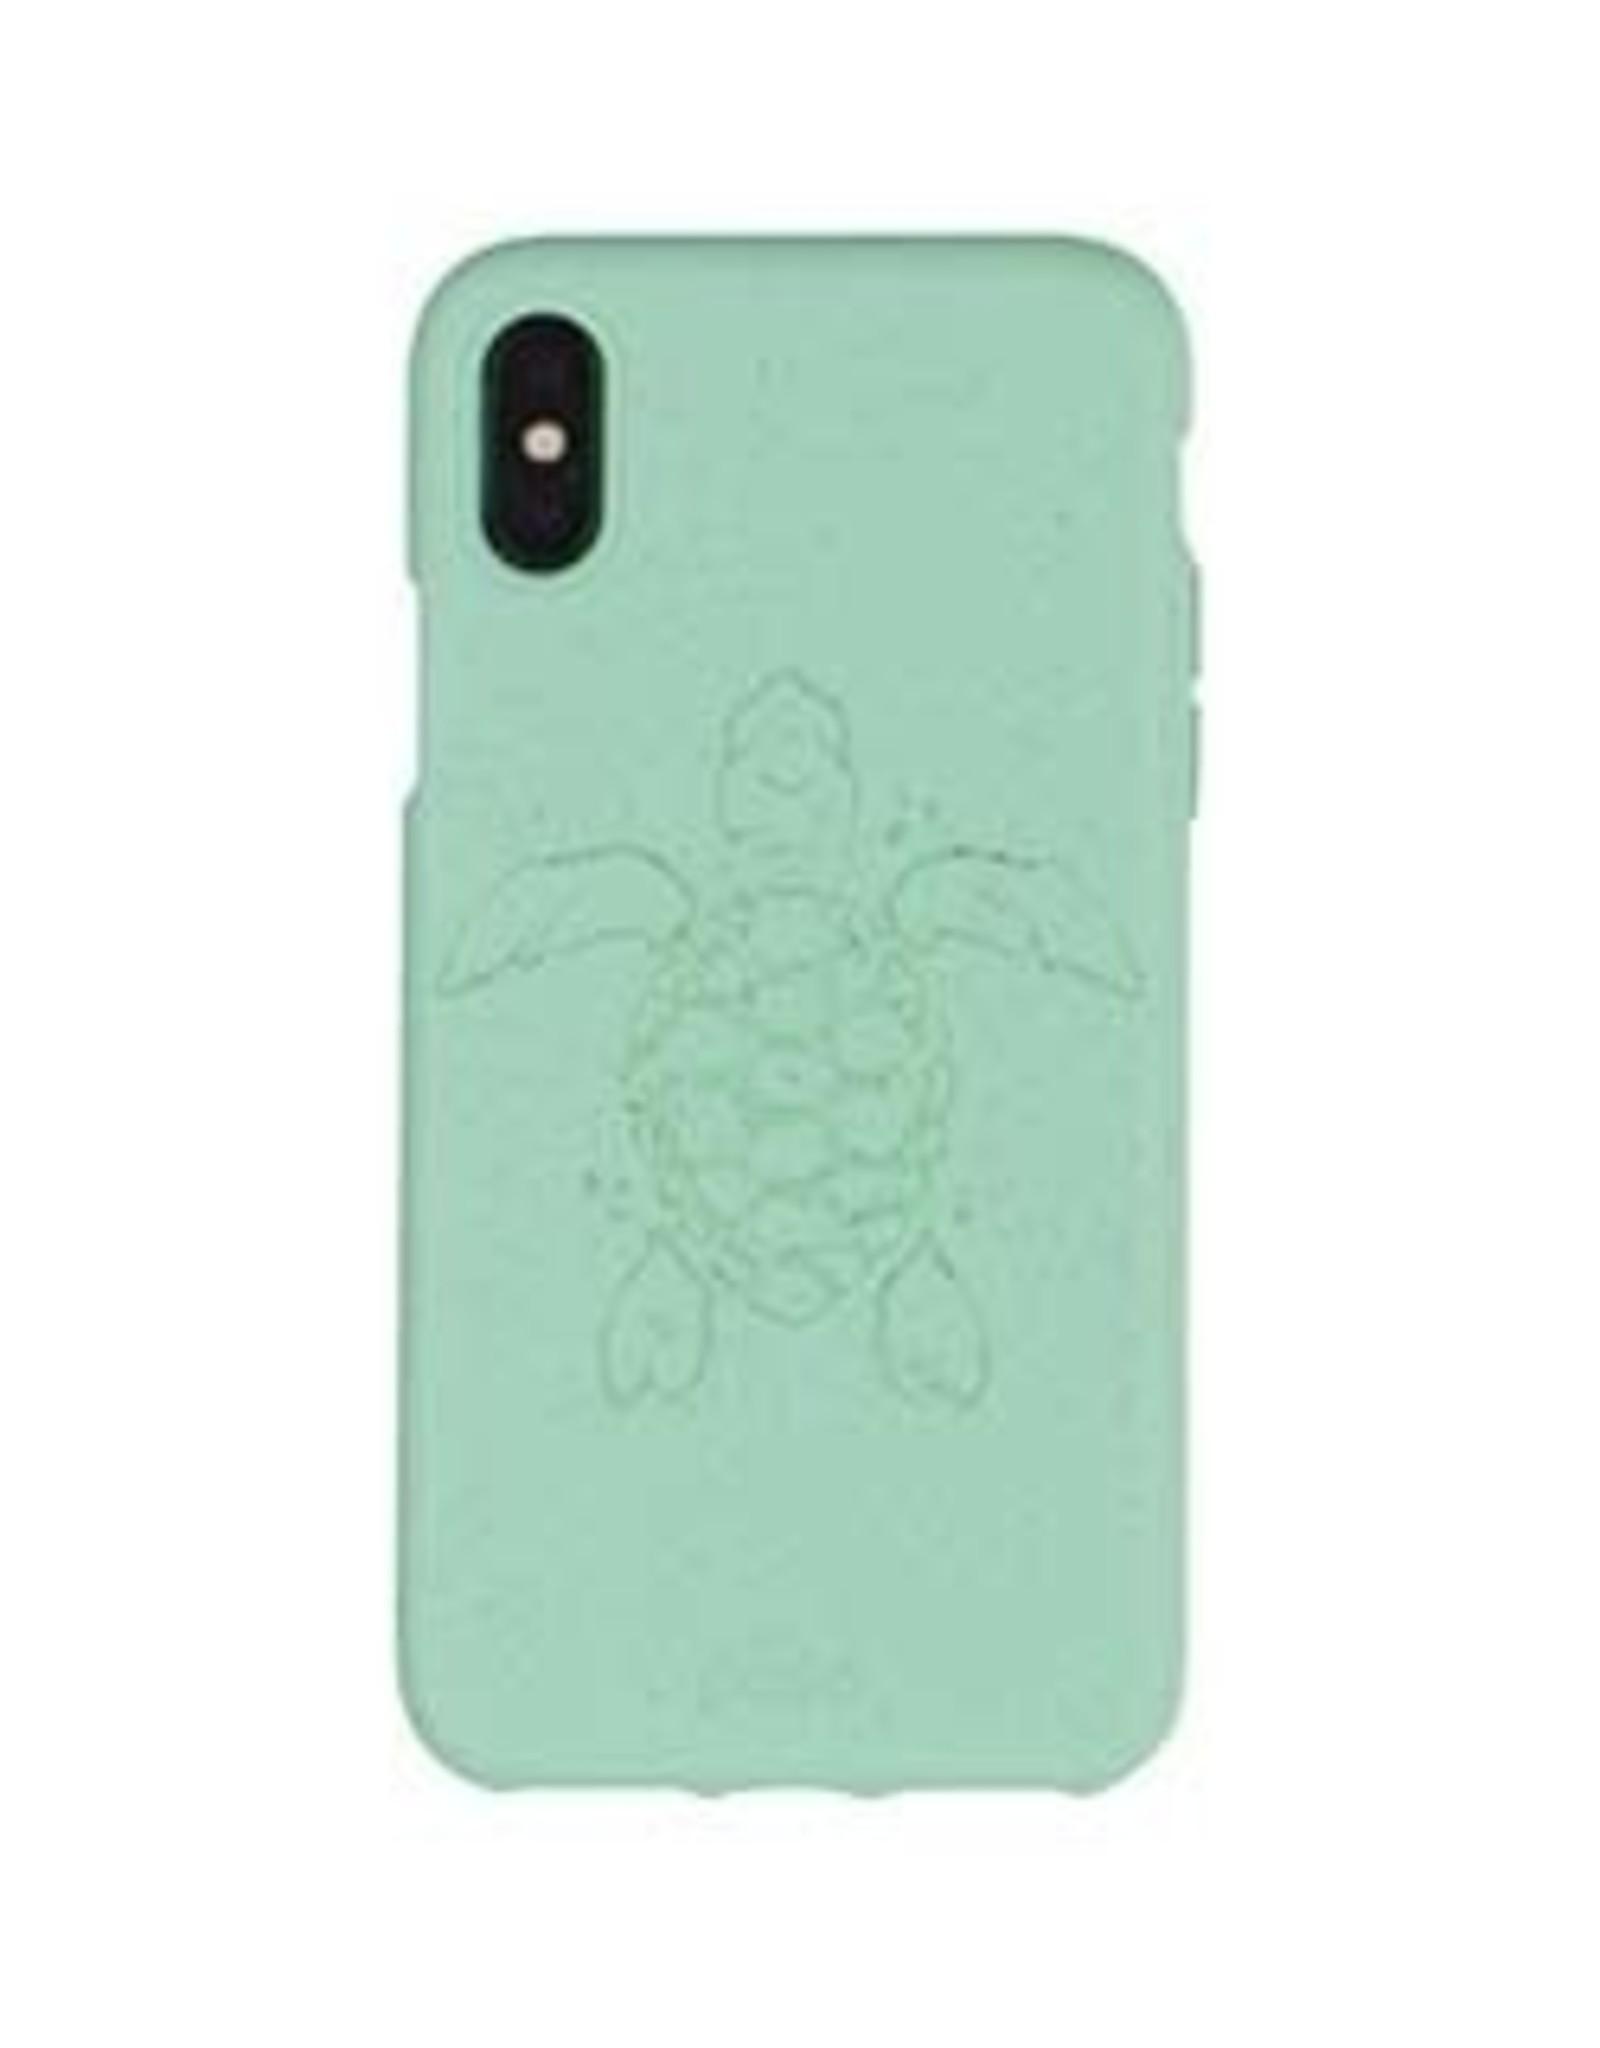 Pela Pela   iPhone X/Xs Turquoise Turtle Edition Compostable Eco-Friendly Protective Case   15-04741